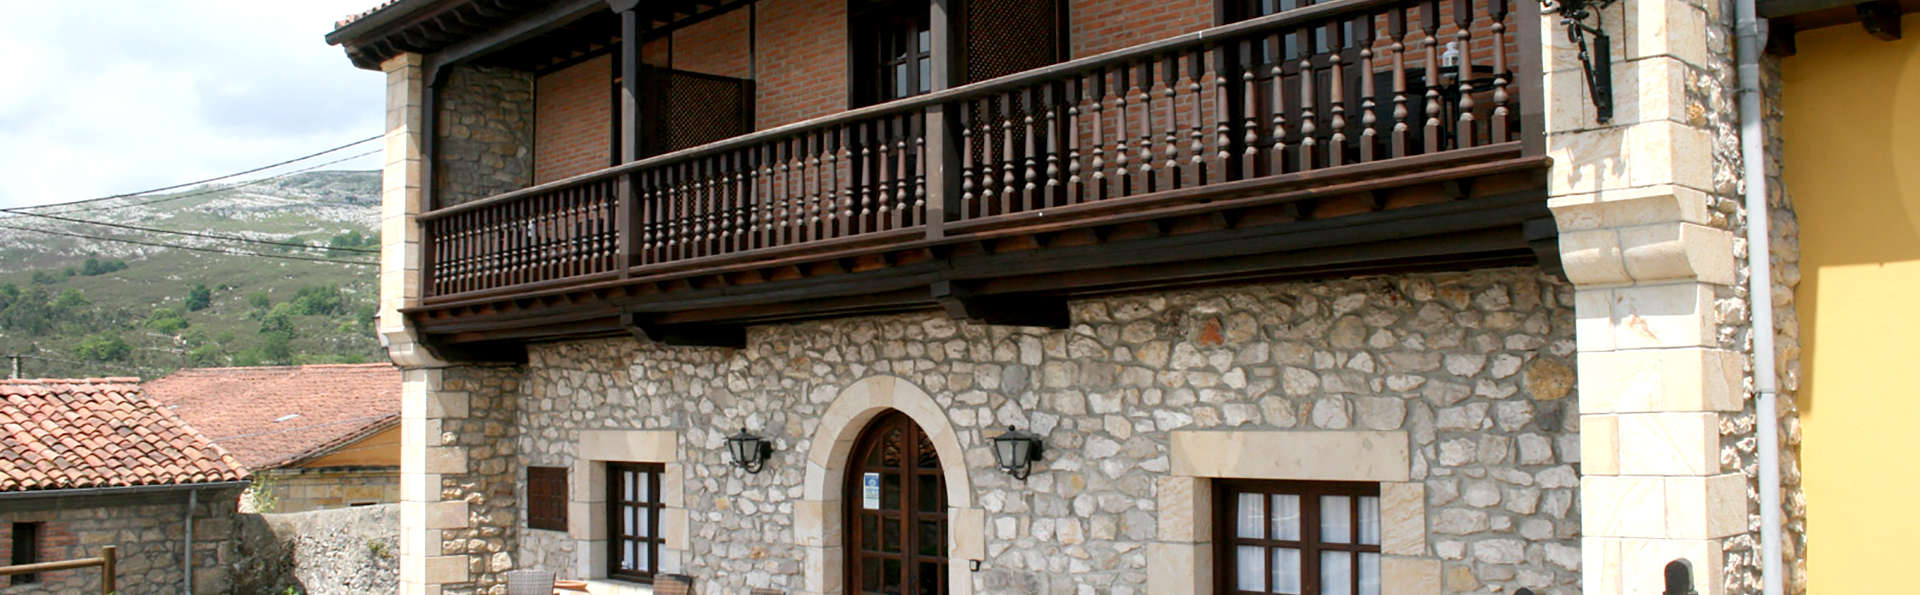 Escapada Romántica con encanto en la naturaleza de Cantabria